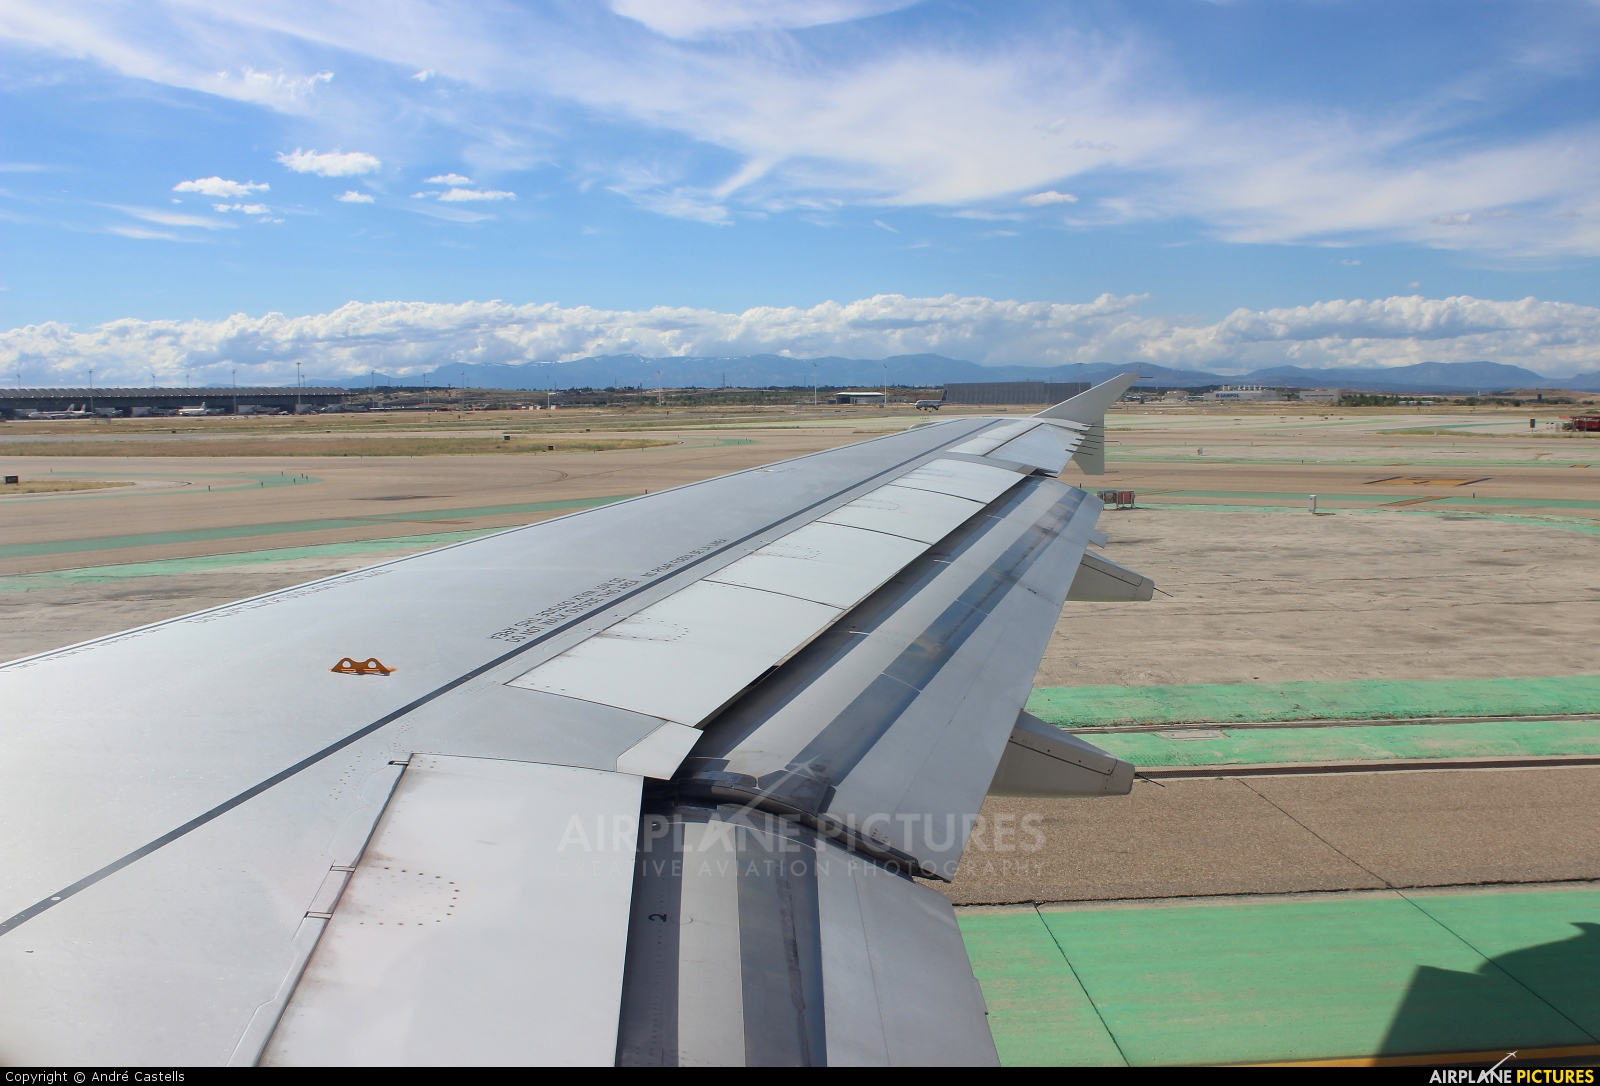 Iberia EC-JFN aircraft at In Flight - Spain